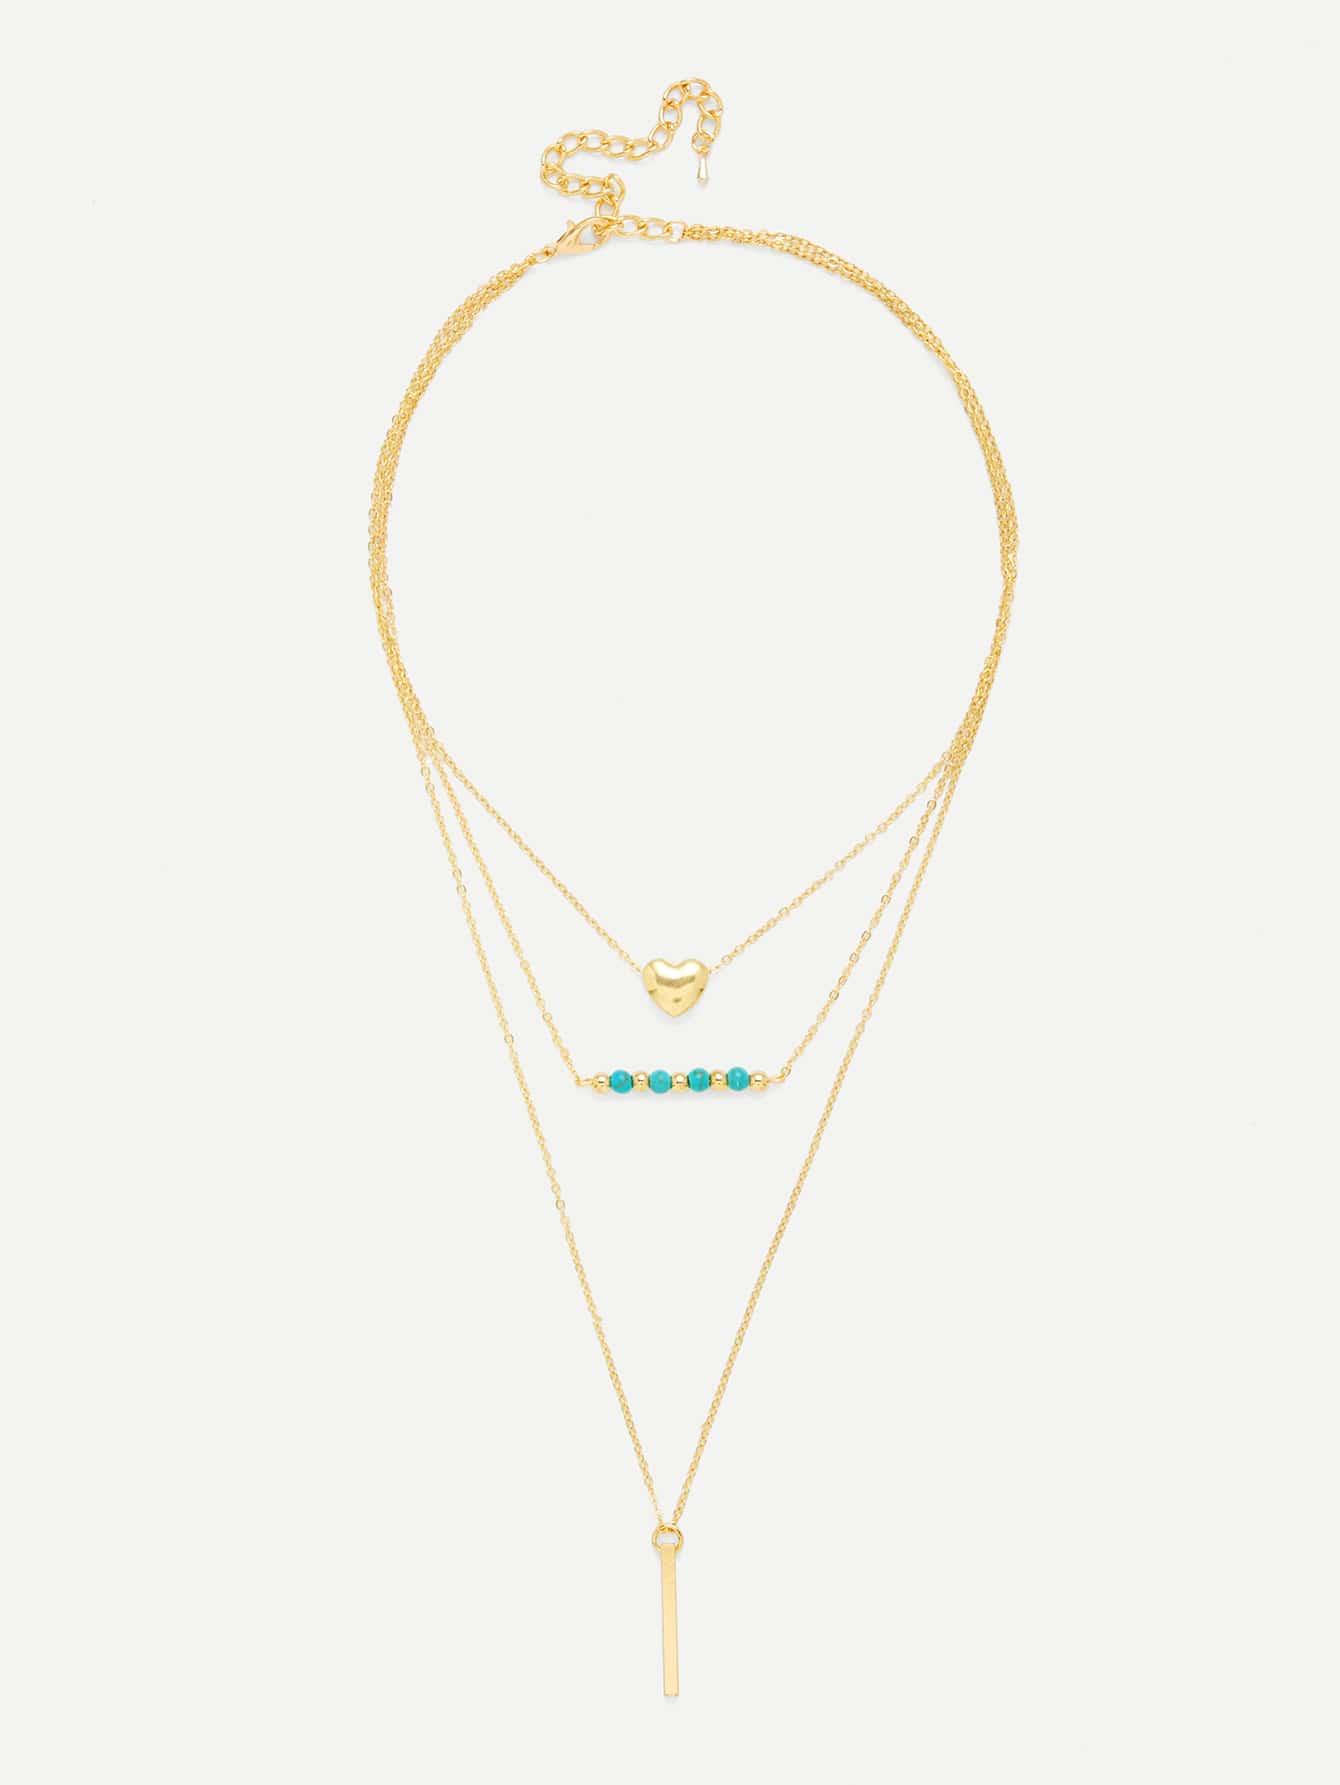 Heart & Bar Pendant Link Layered Necklace heart pendant beaded layered necklace